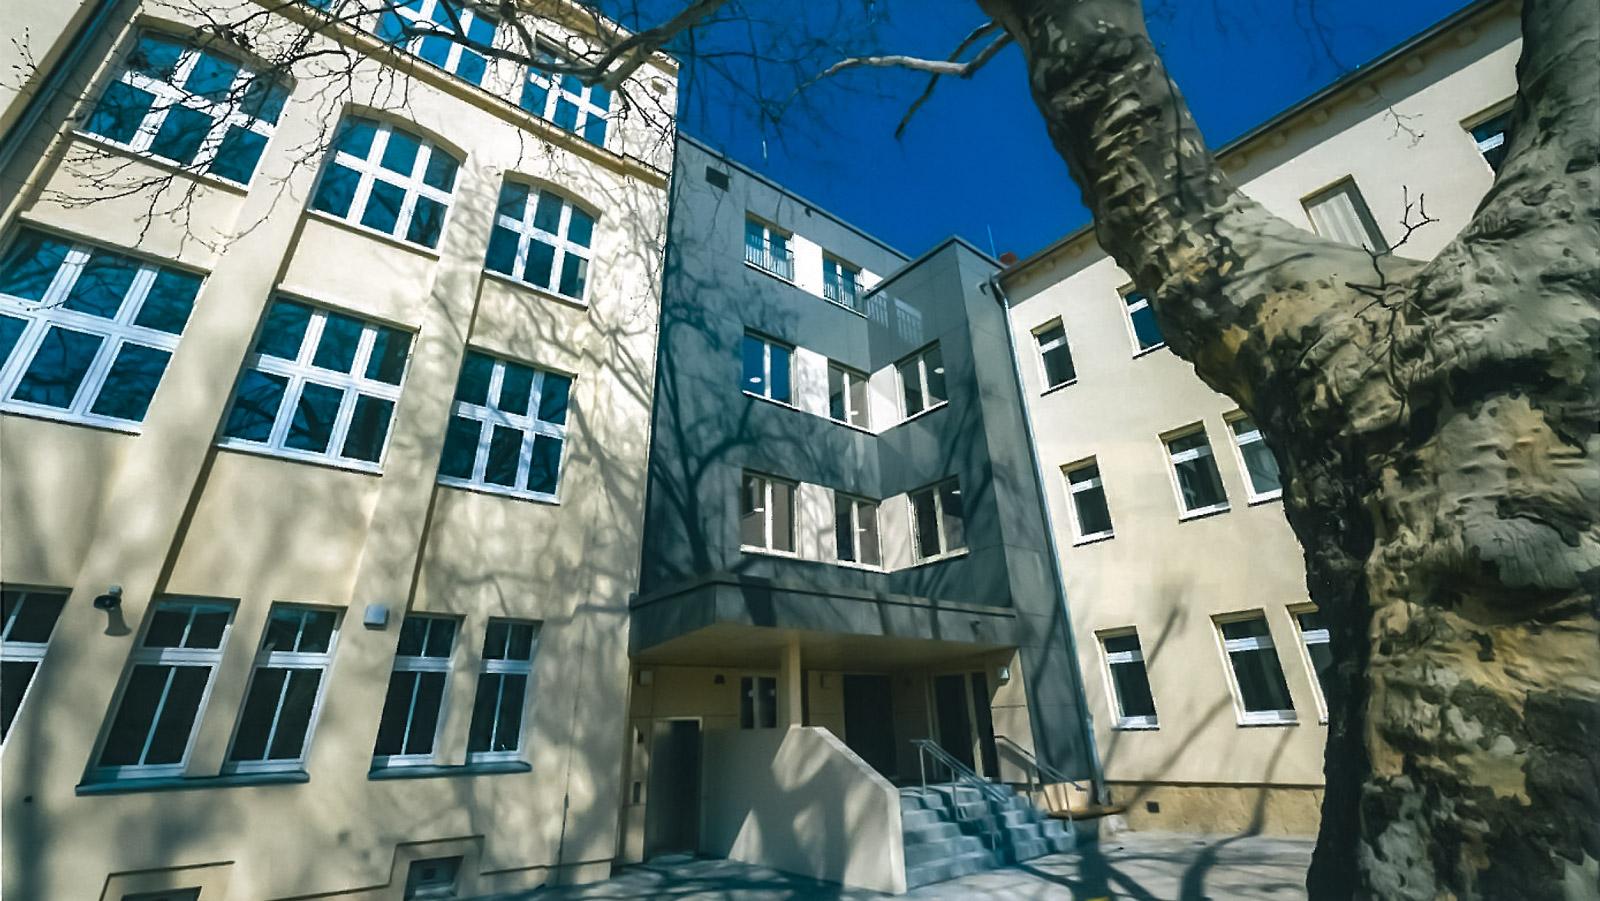 Sanierung 15. Grundschule, Dresden